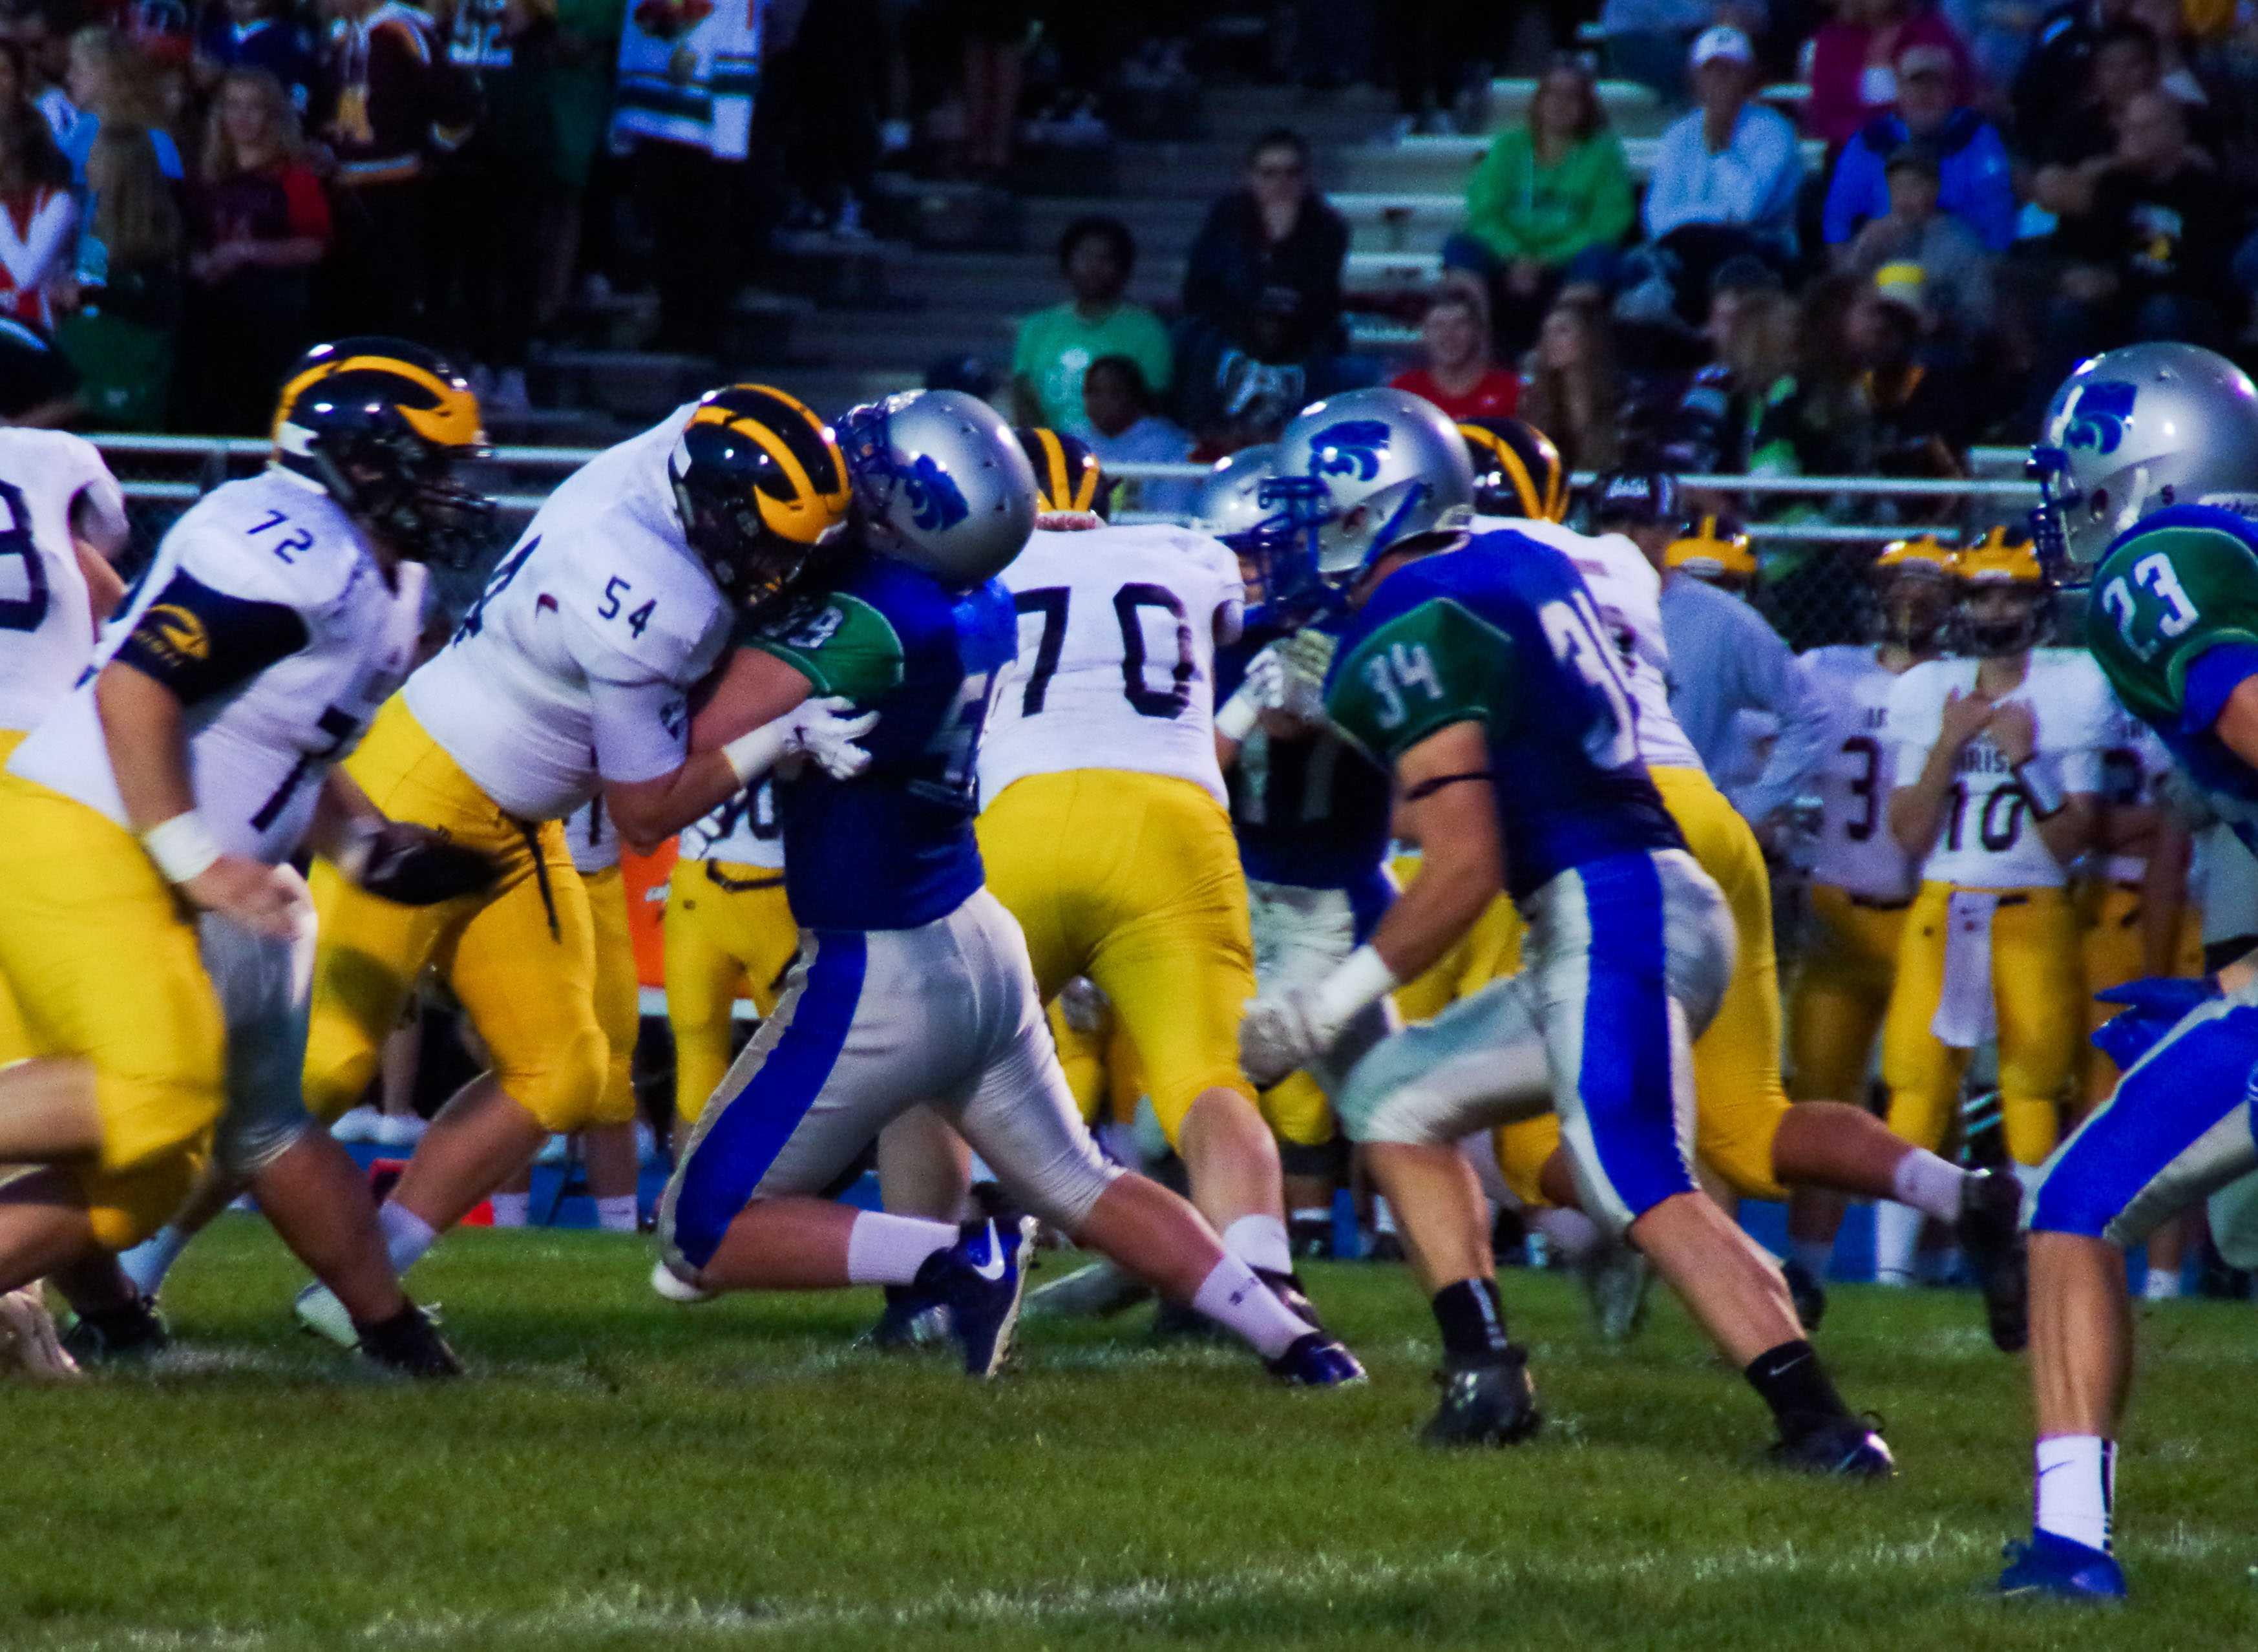 Eagan's defense meets Rosemount's offense